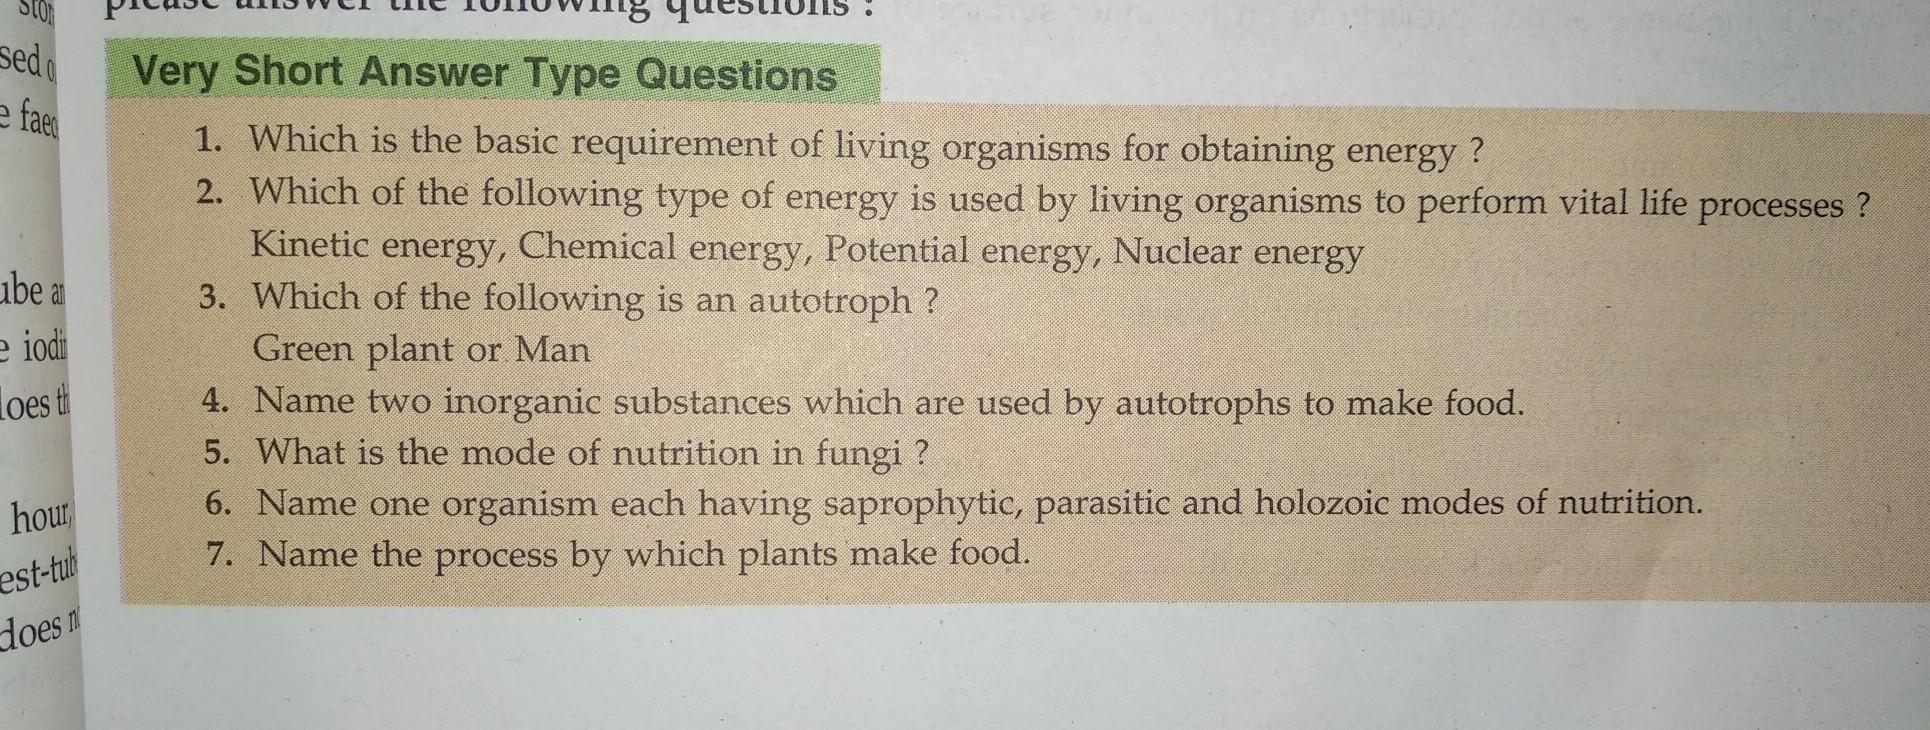 please 1 to 7 questions answered karna hai sab ka answer copy par